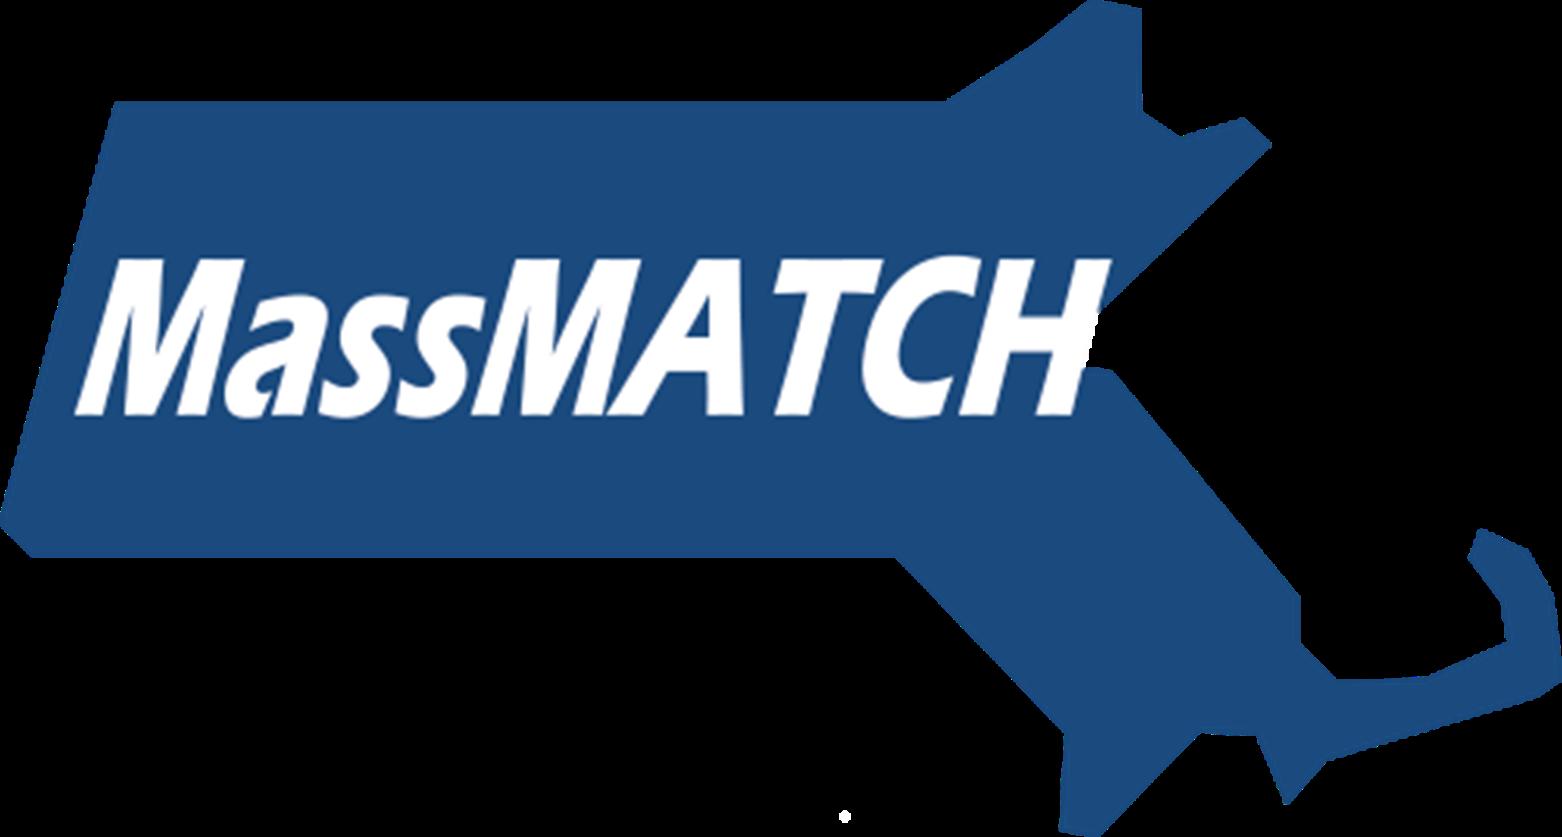 Massachusetts MassMATCH logo